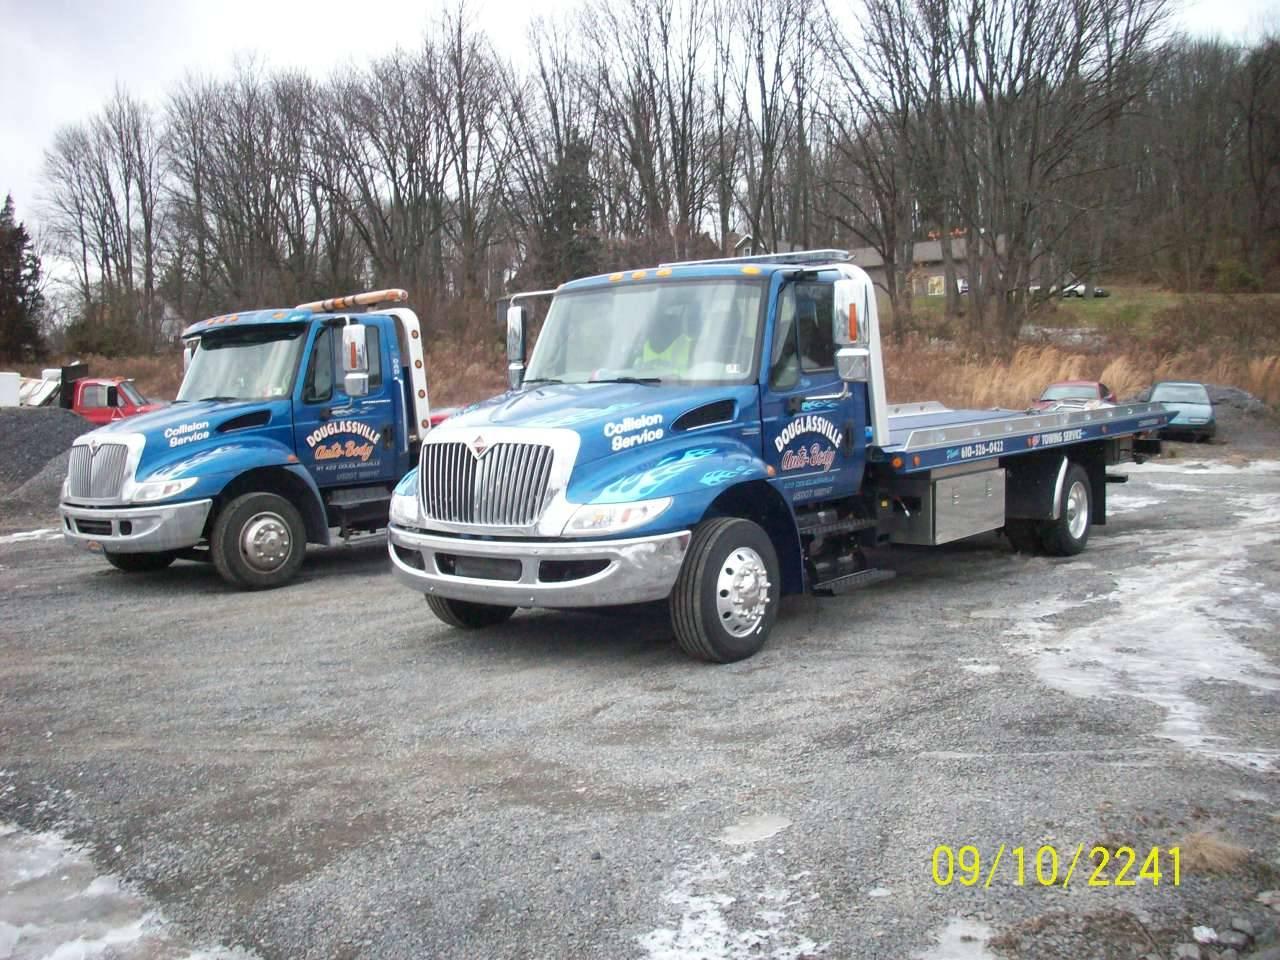 2005 & 2008 Int'l Twins - Chevron S-10 Steel Beds